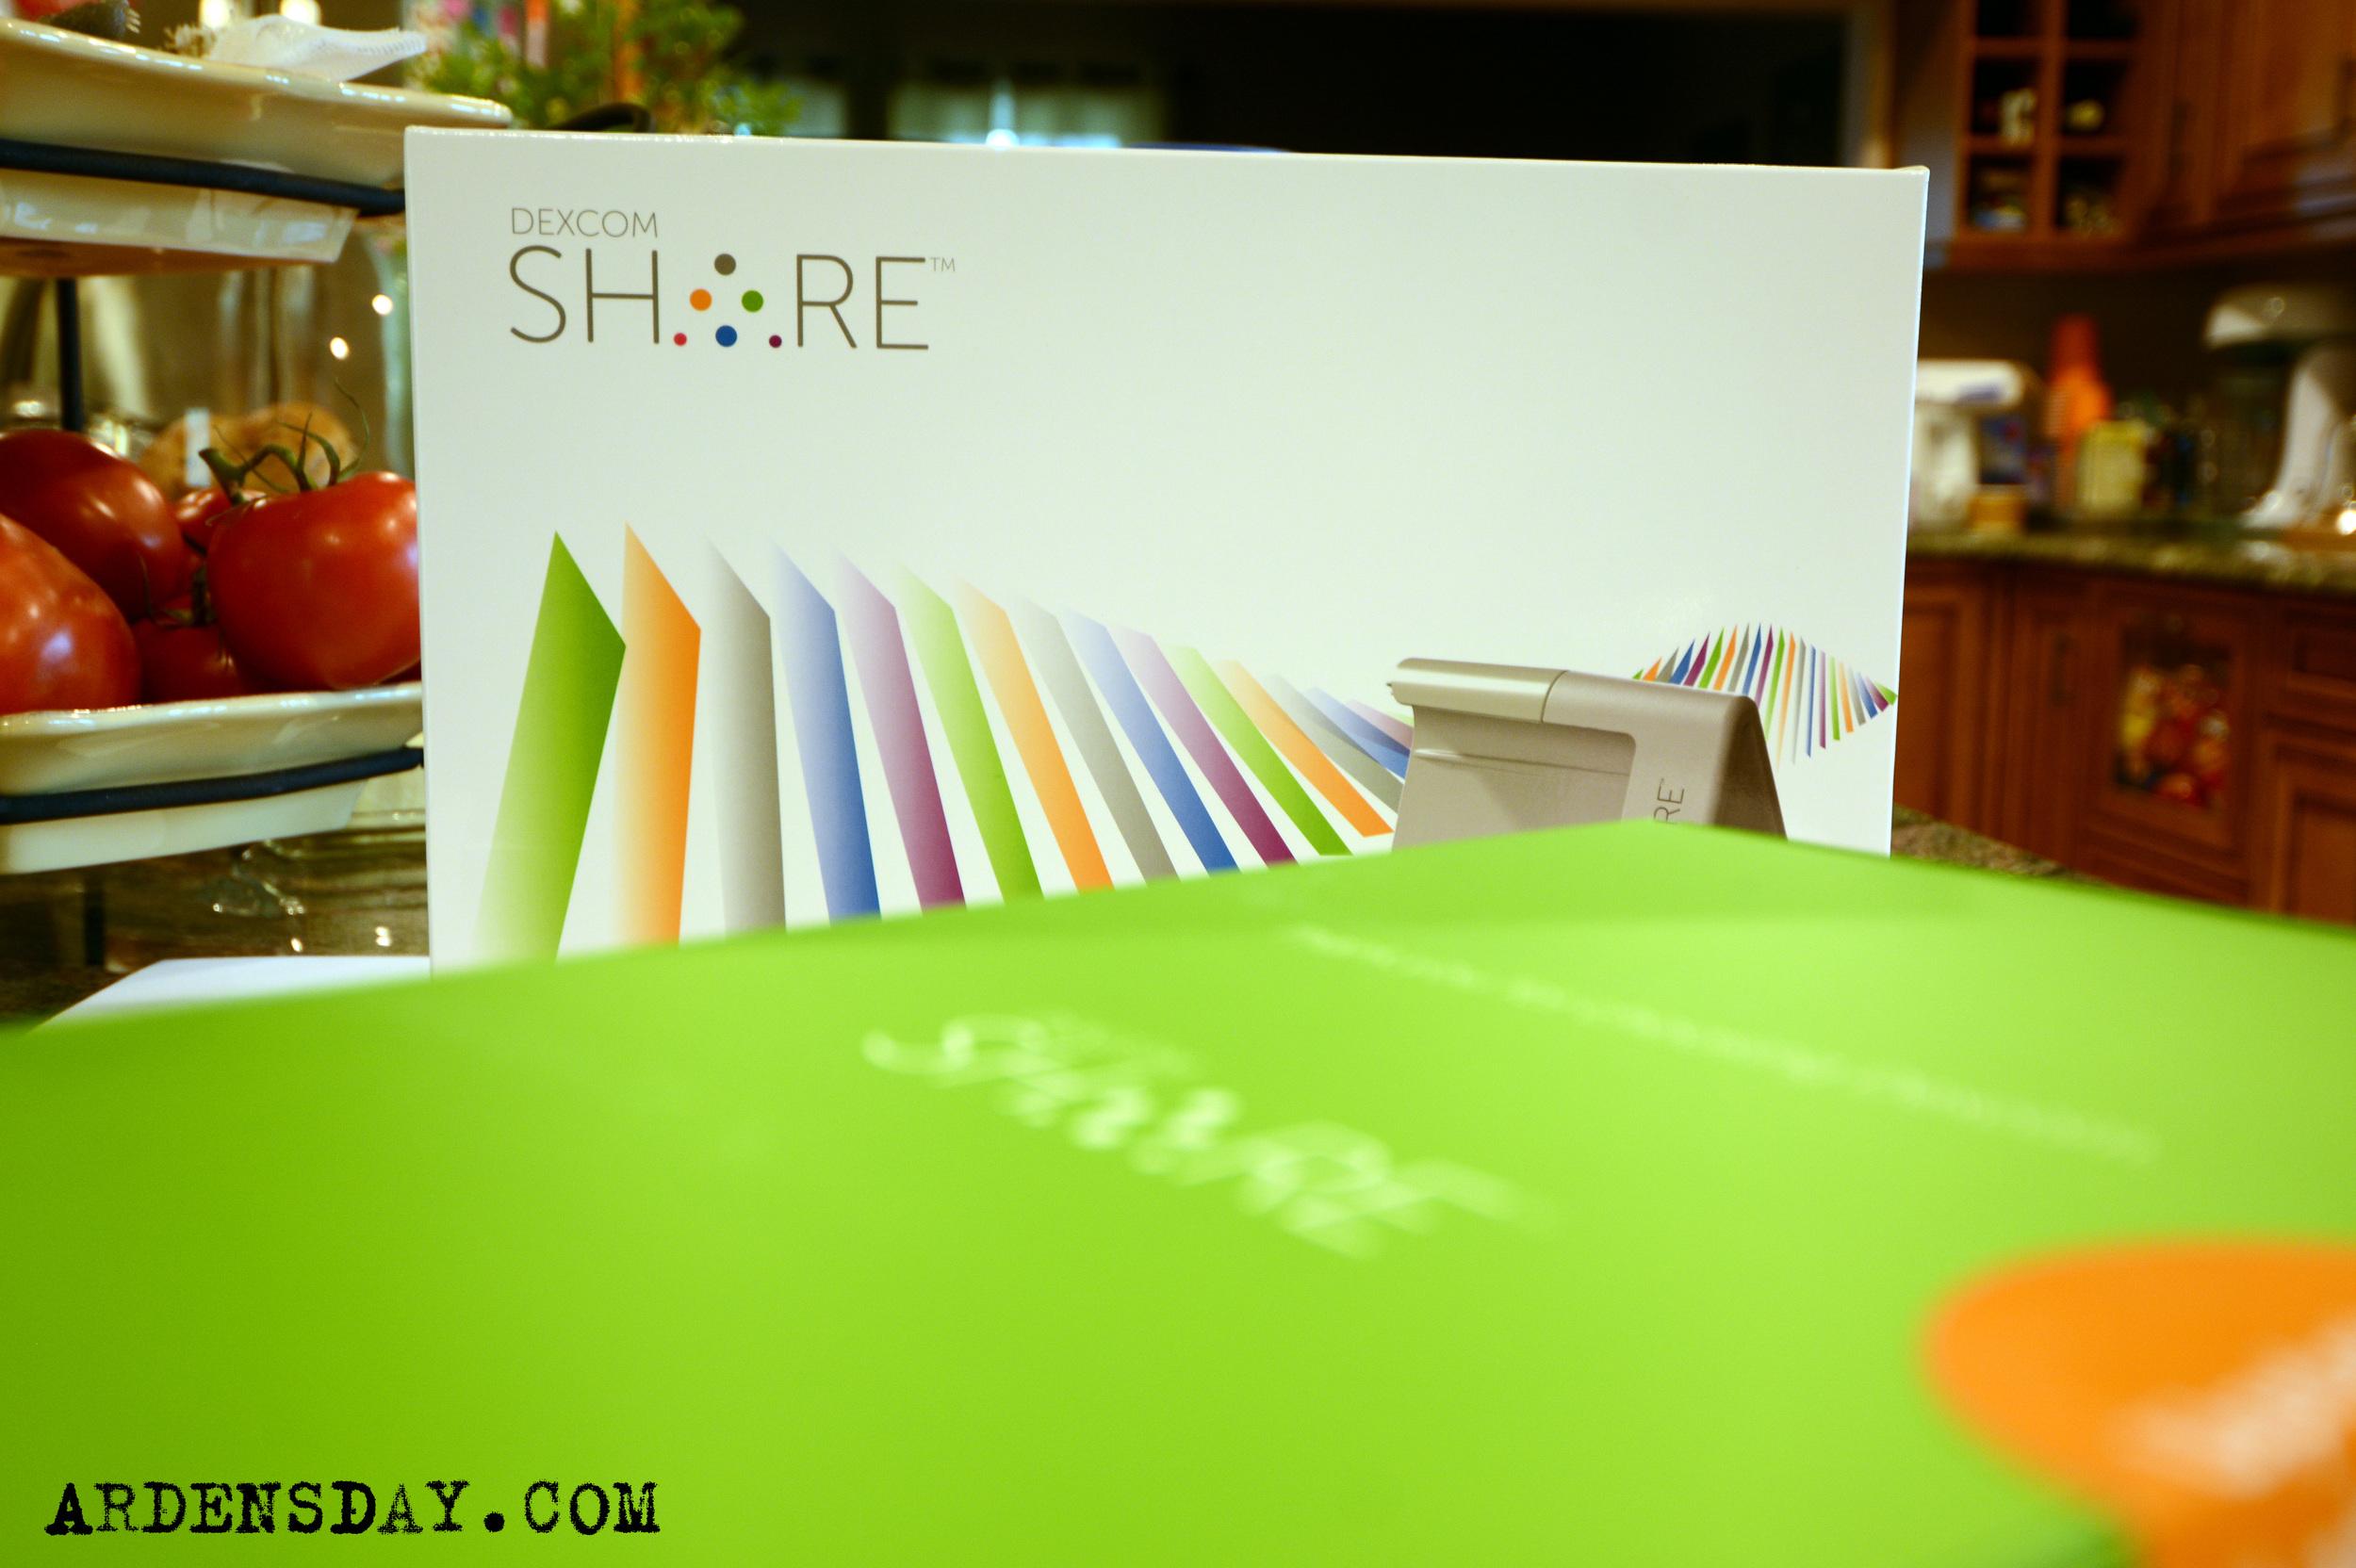 Dexcom SHARE unboxing__9670.JPG